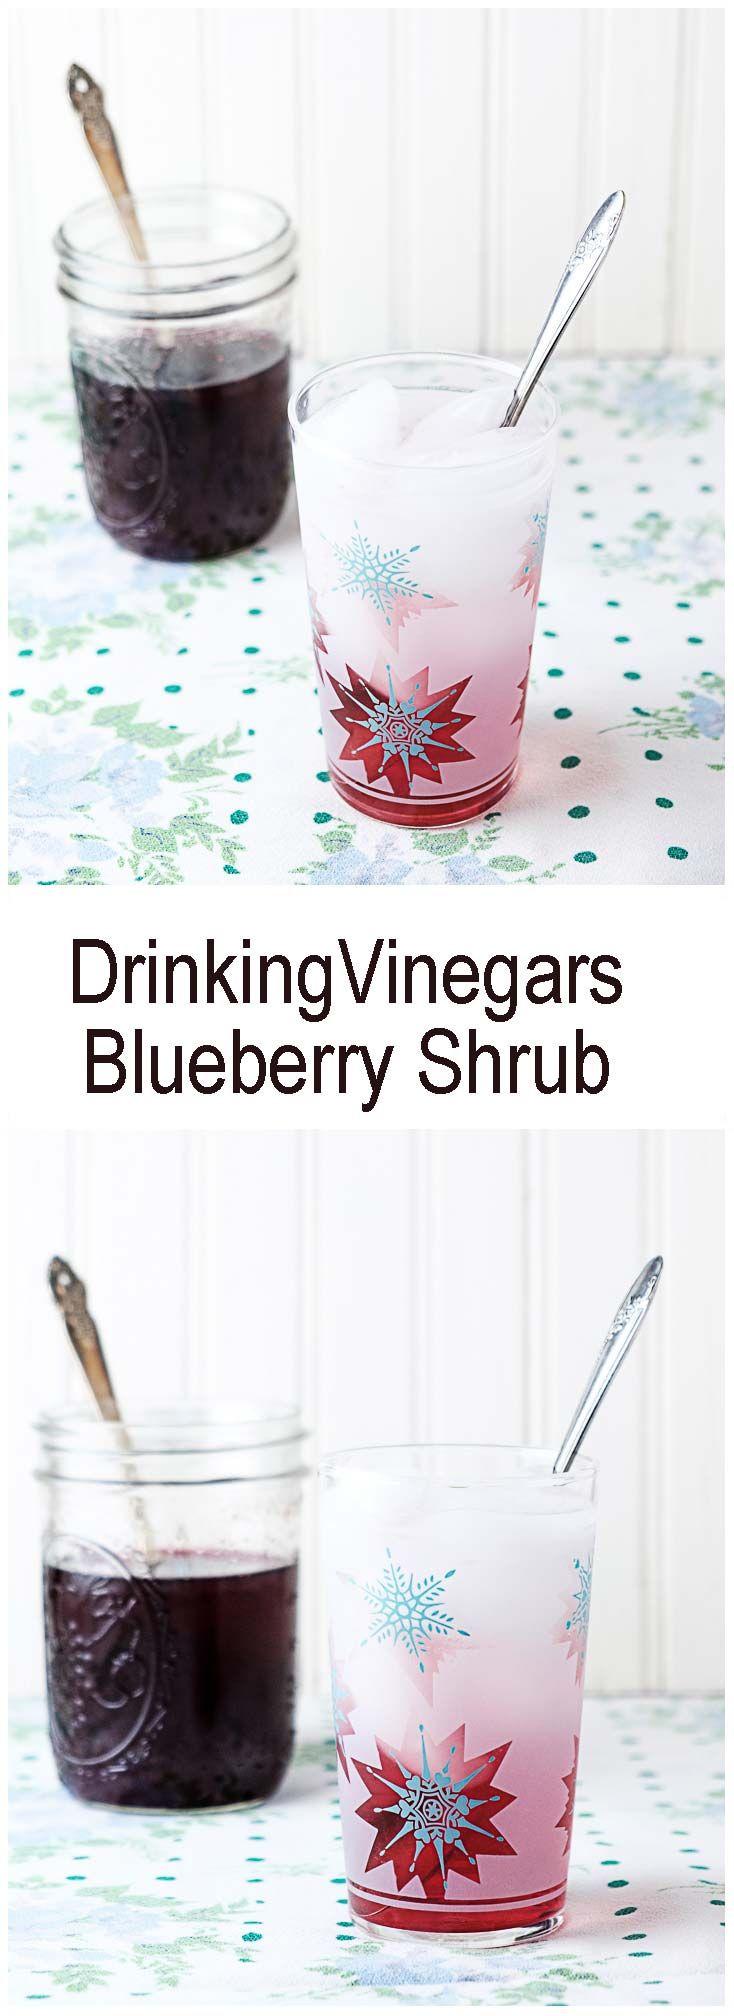 Drinking Vinegars - Blueberry Shrub Recipe - a delicious old fashioned drink!  #drinkingvinegars #drinkingshrubs